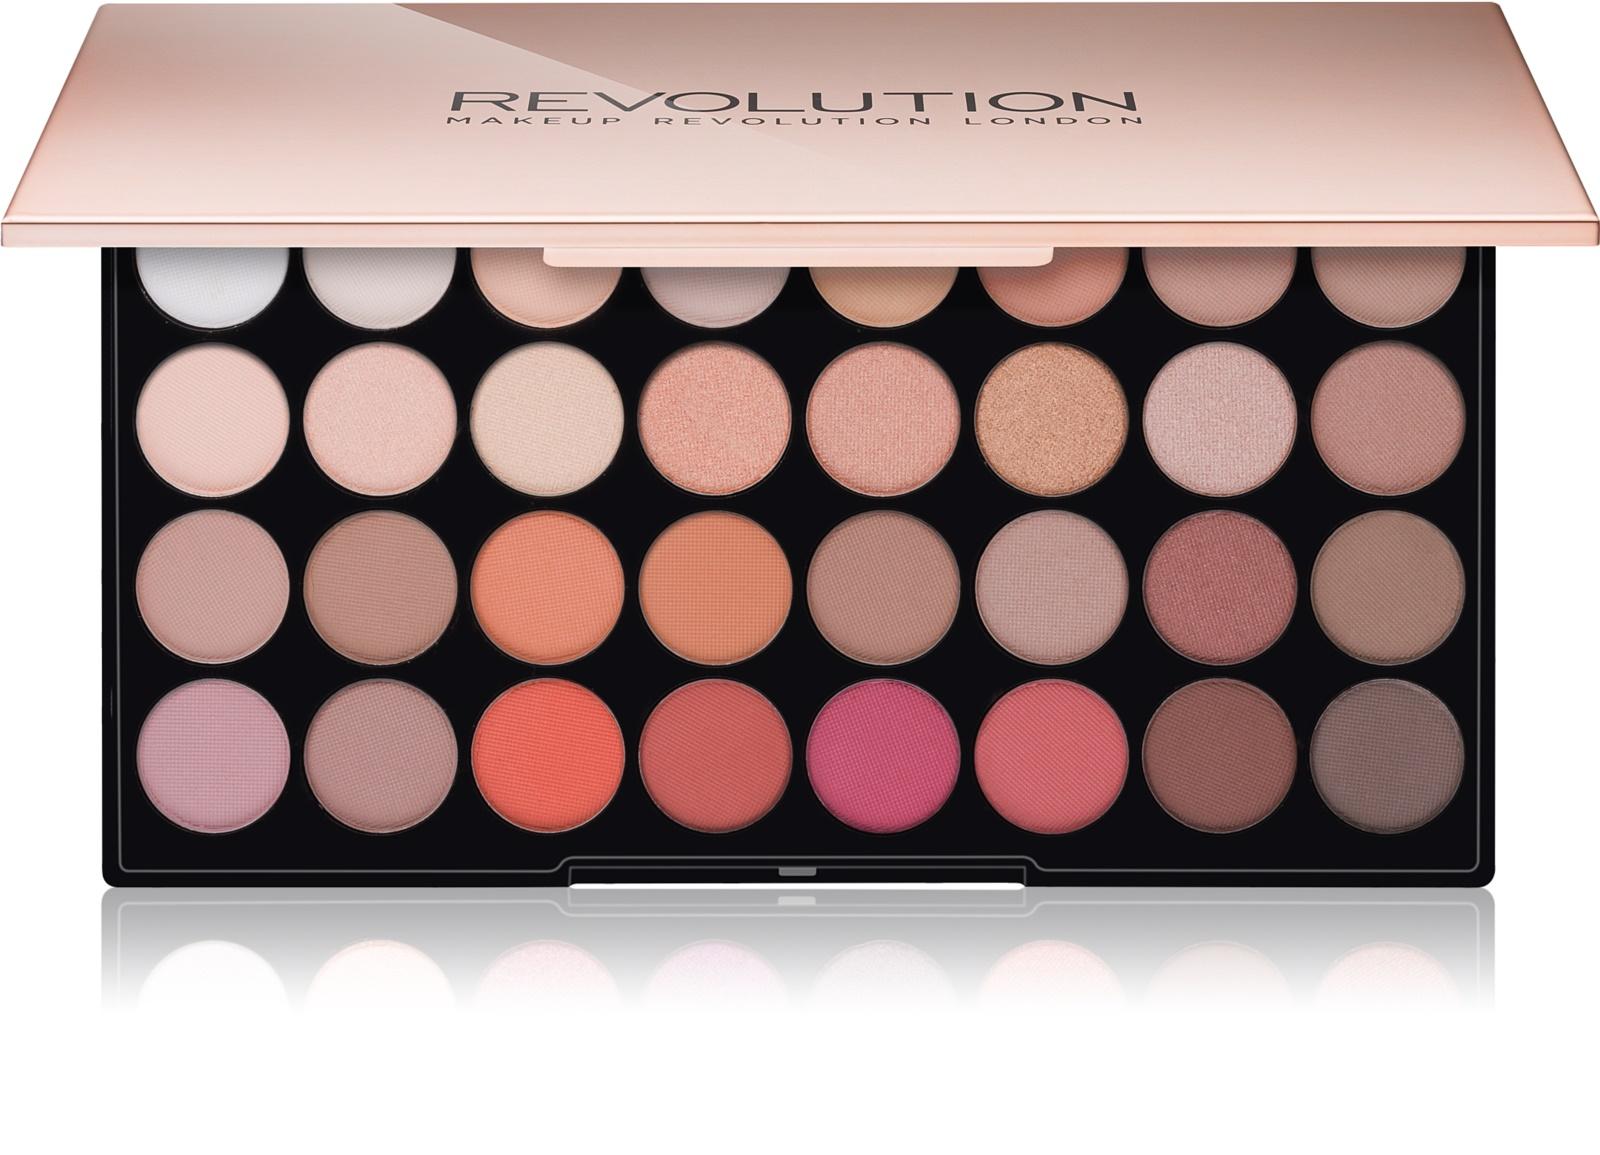 makeup-revolution-ultra-flawless-3-szemhejfestek-paletta_5.jpg